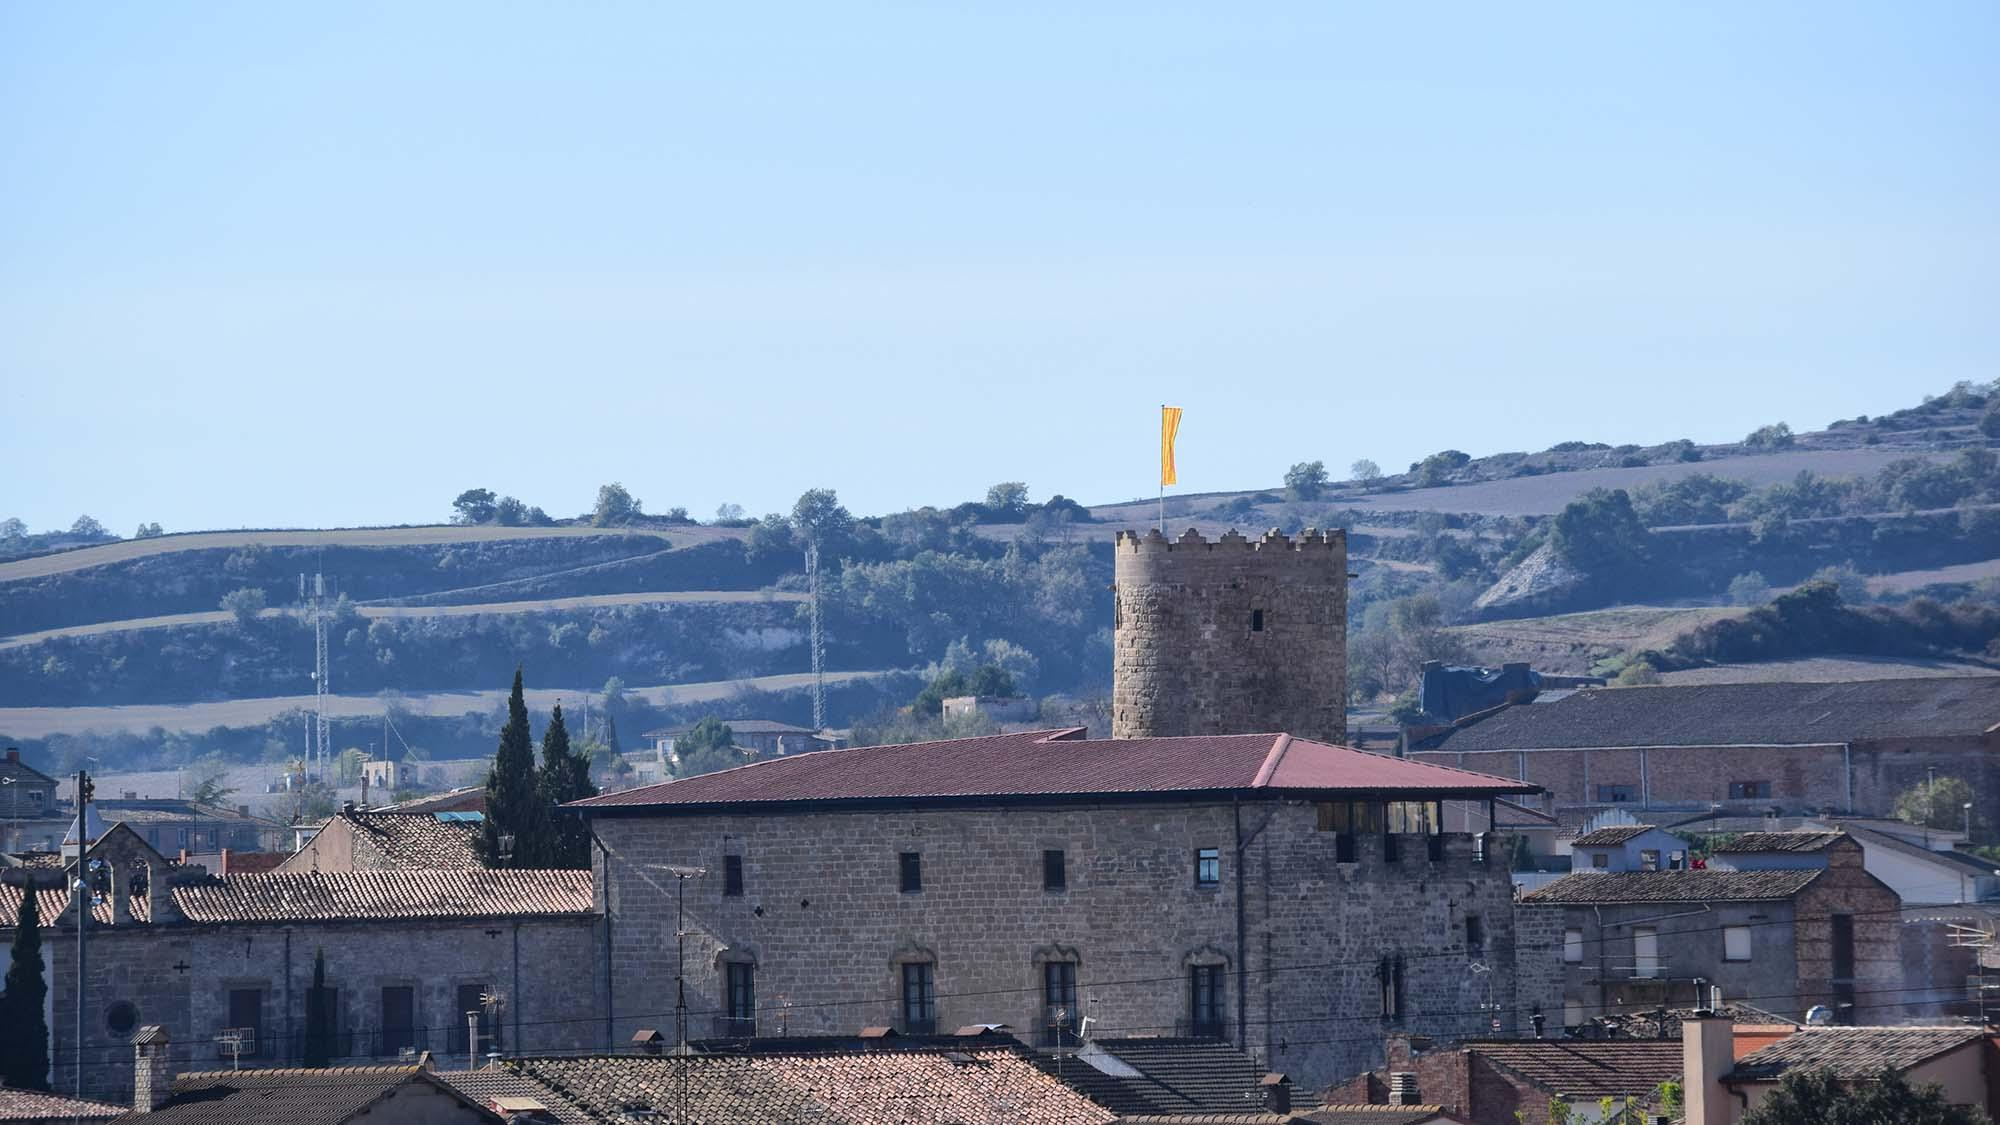 Castillo de Santa Coloma